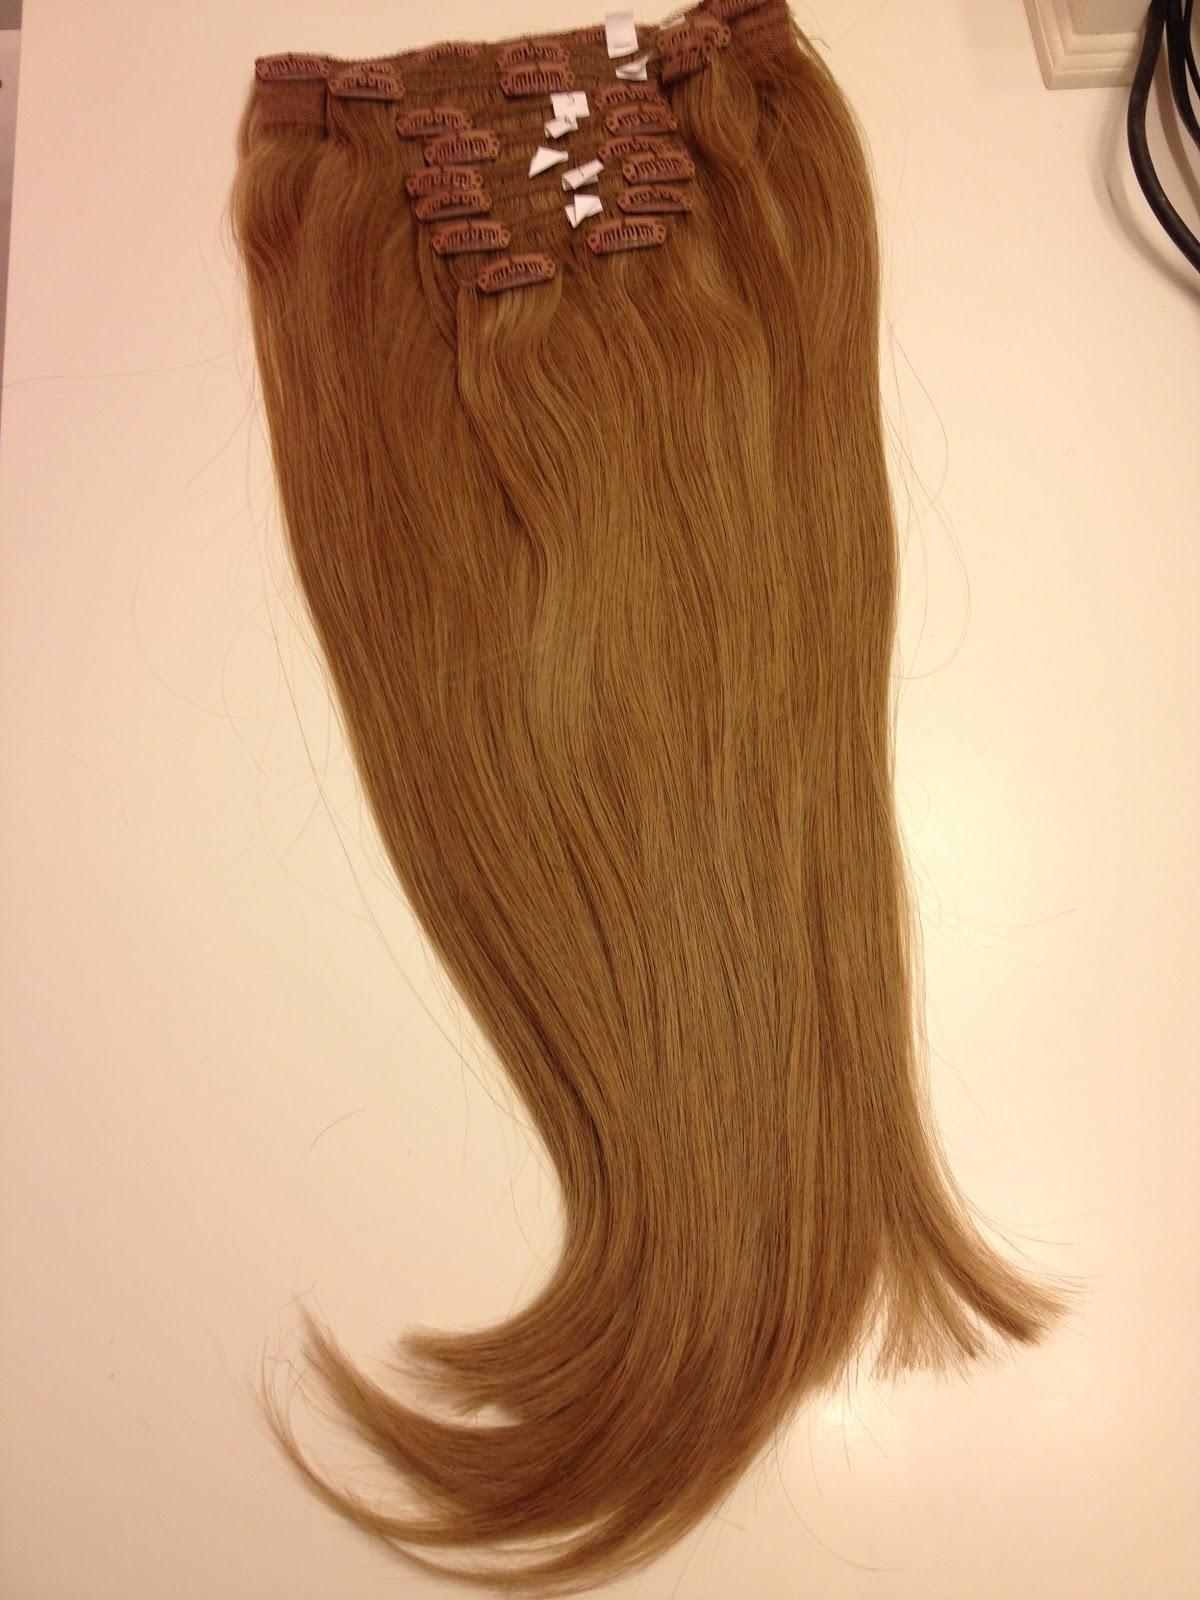 Headkandy Hair Extensions 16 18 Gallery Hair Extensions For Short Hair